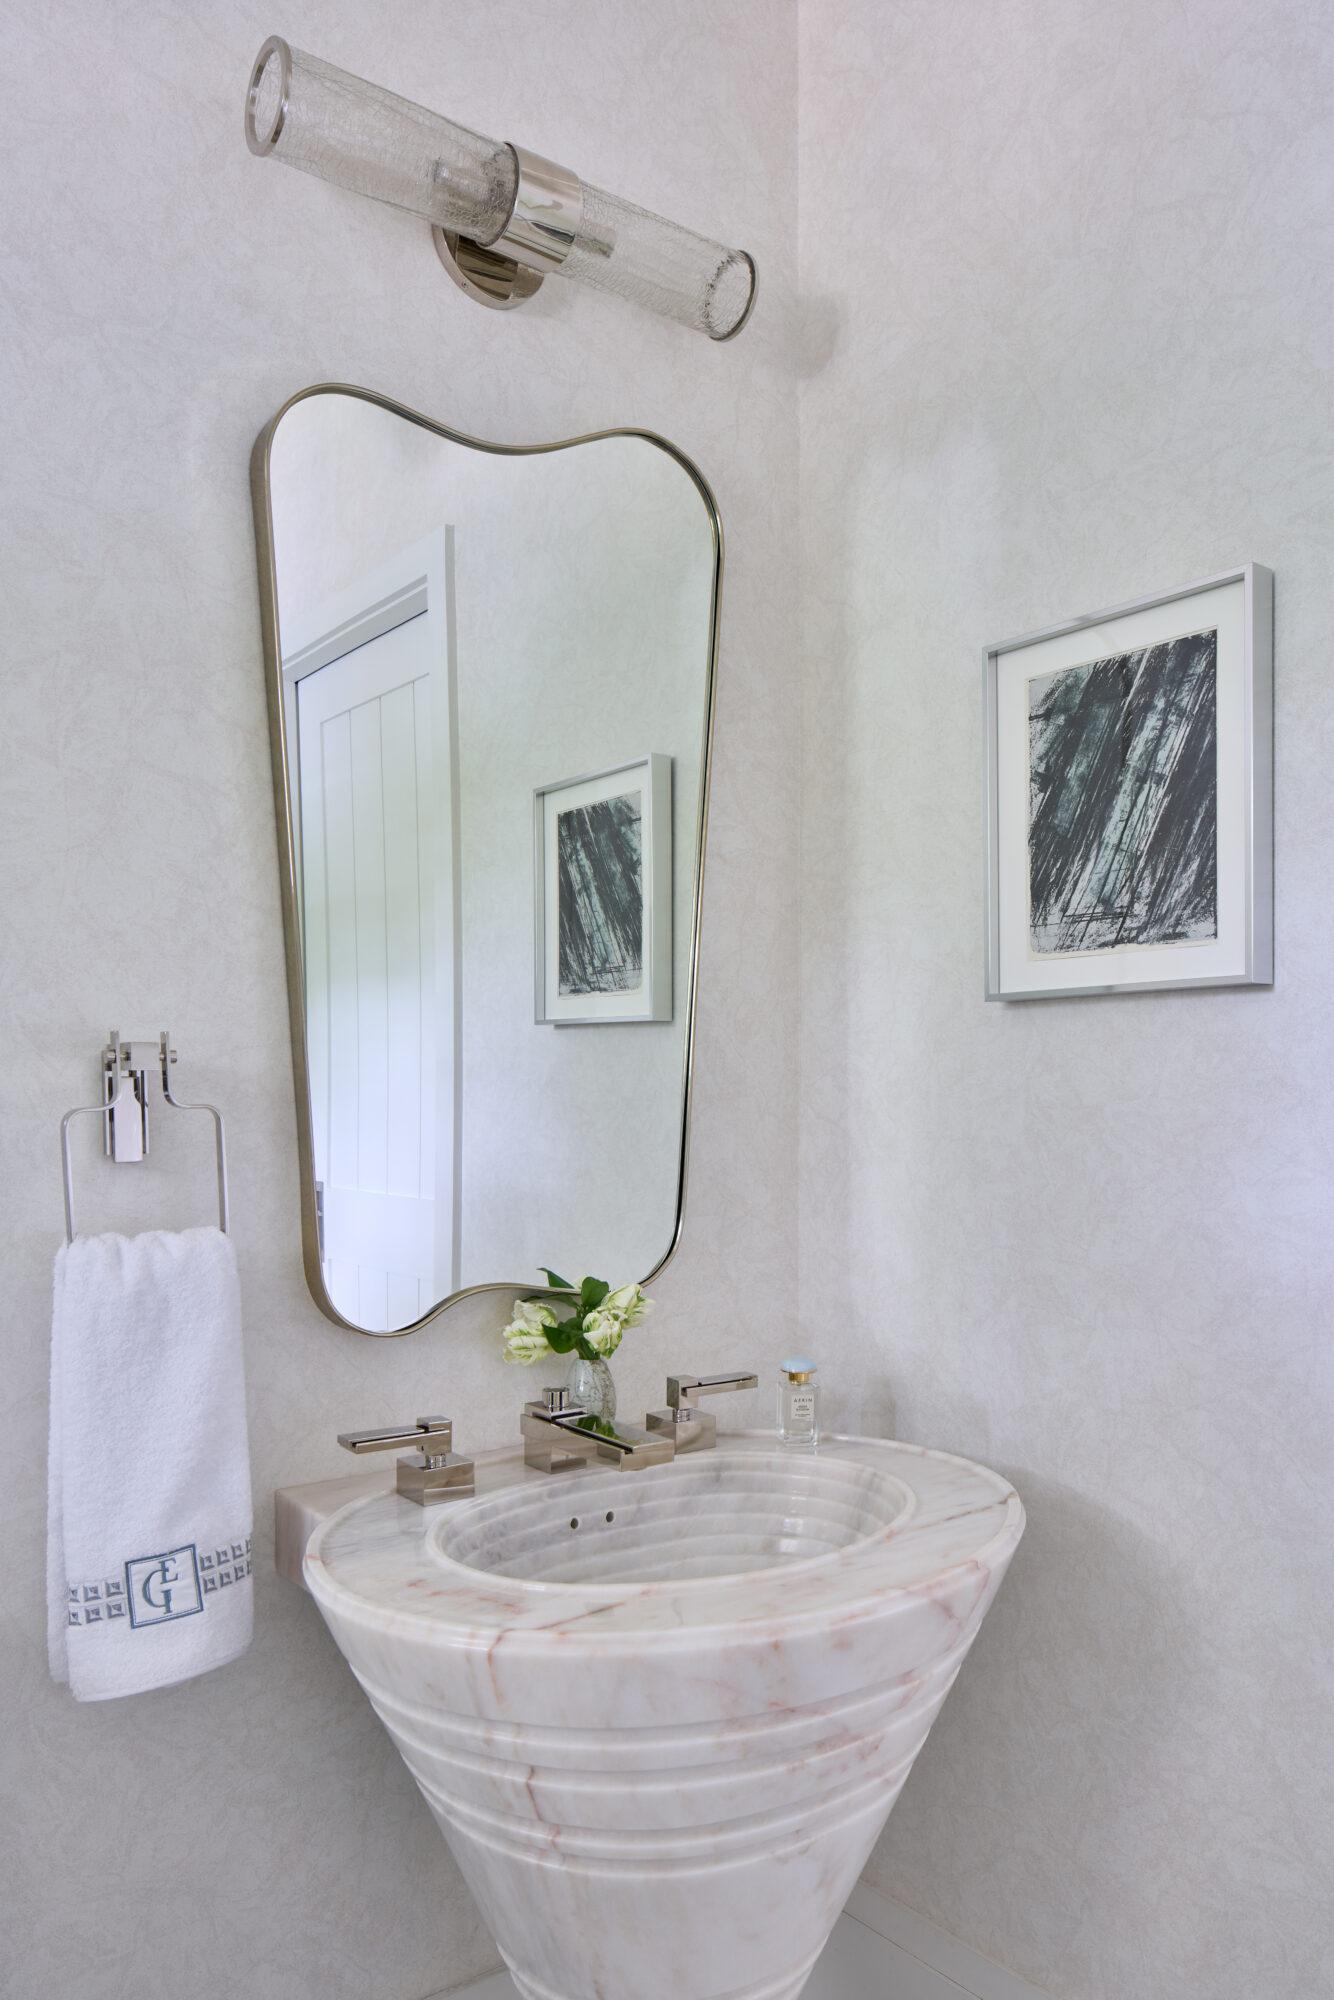 organic shaped curved bathroom mirror and stone sink Elizabeth gill interiors